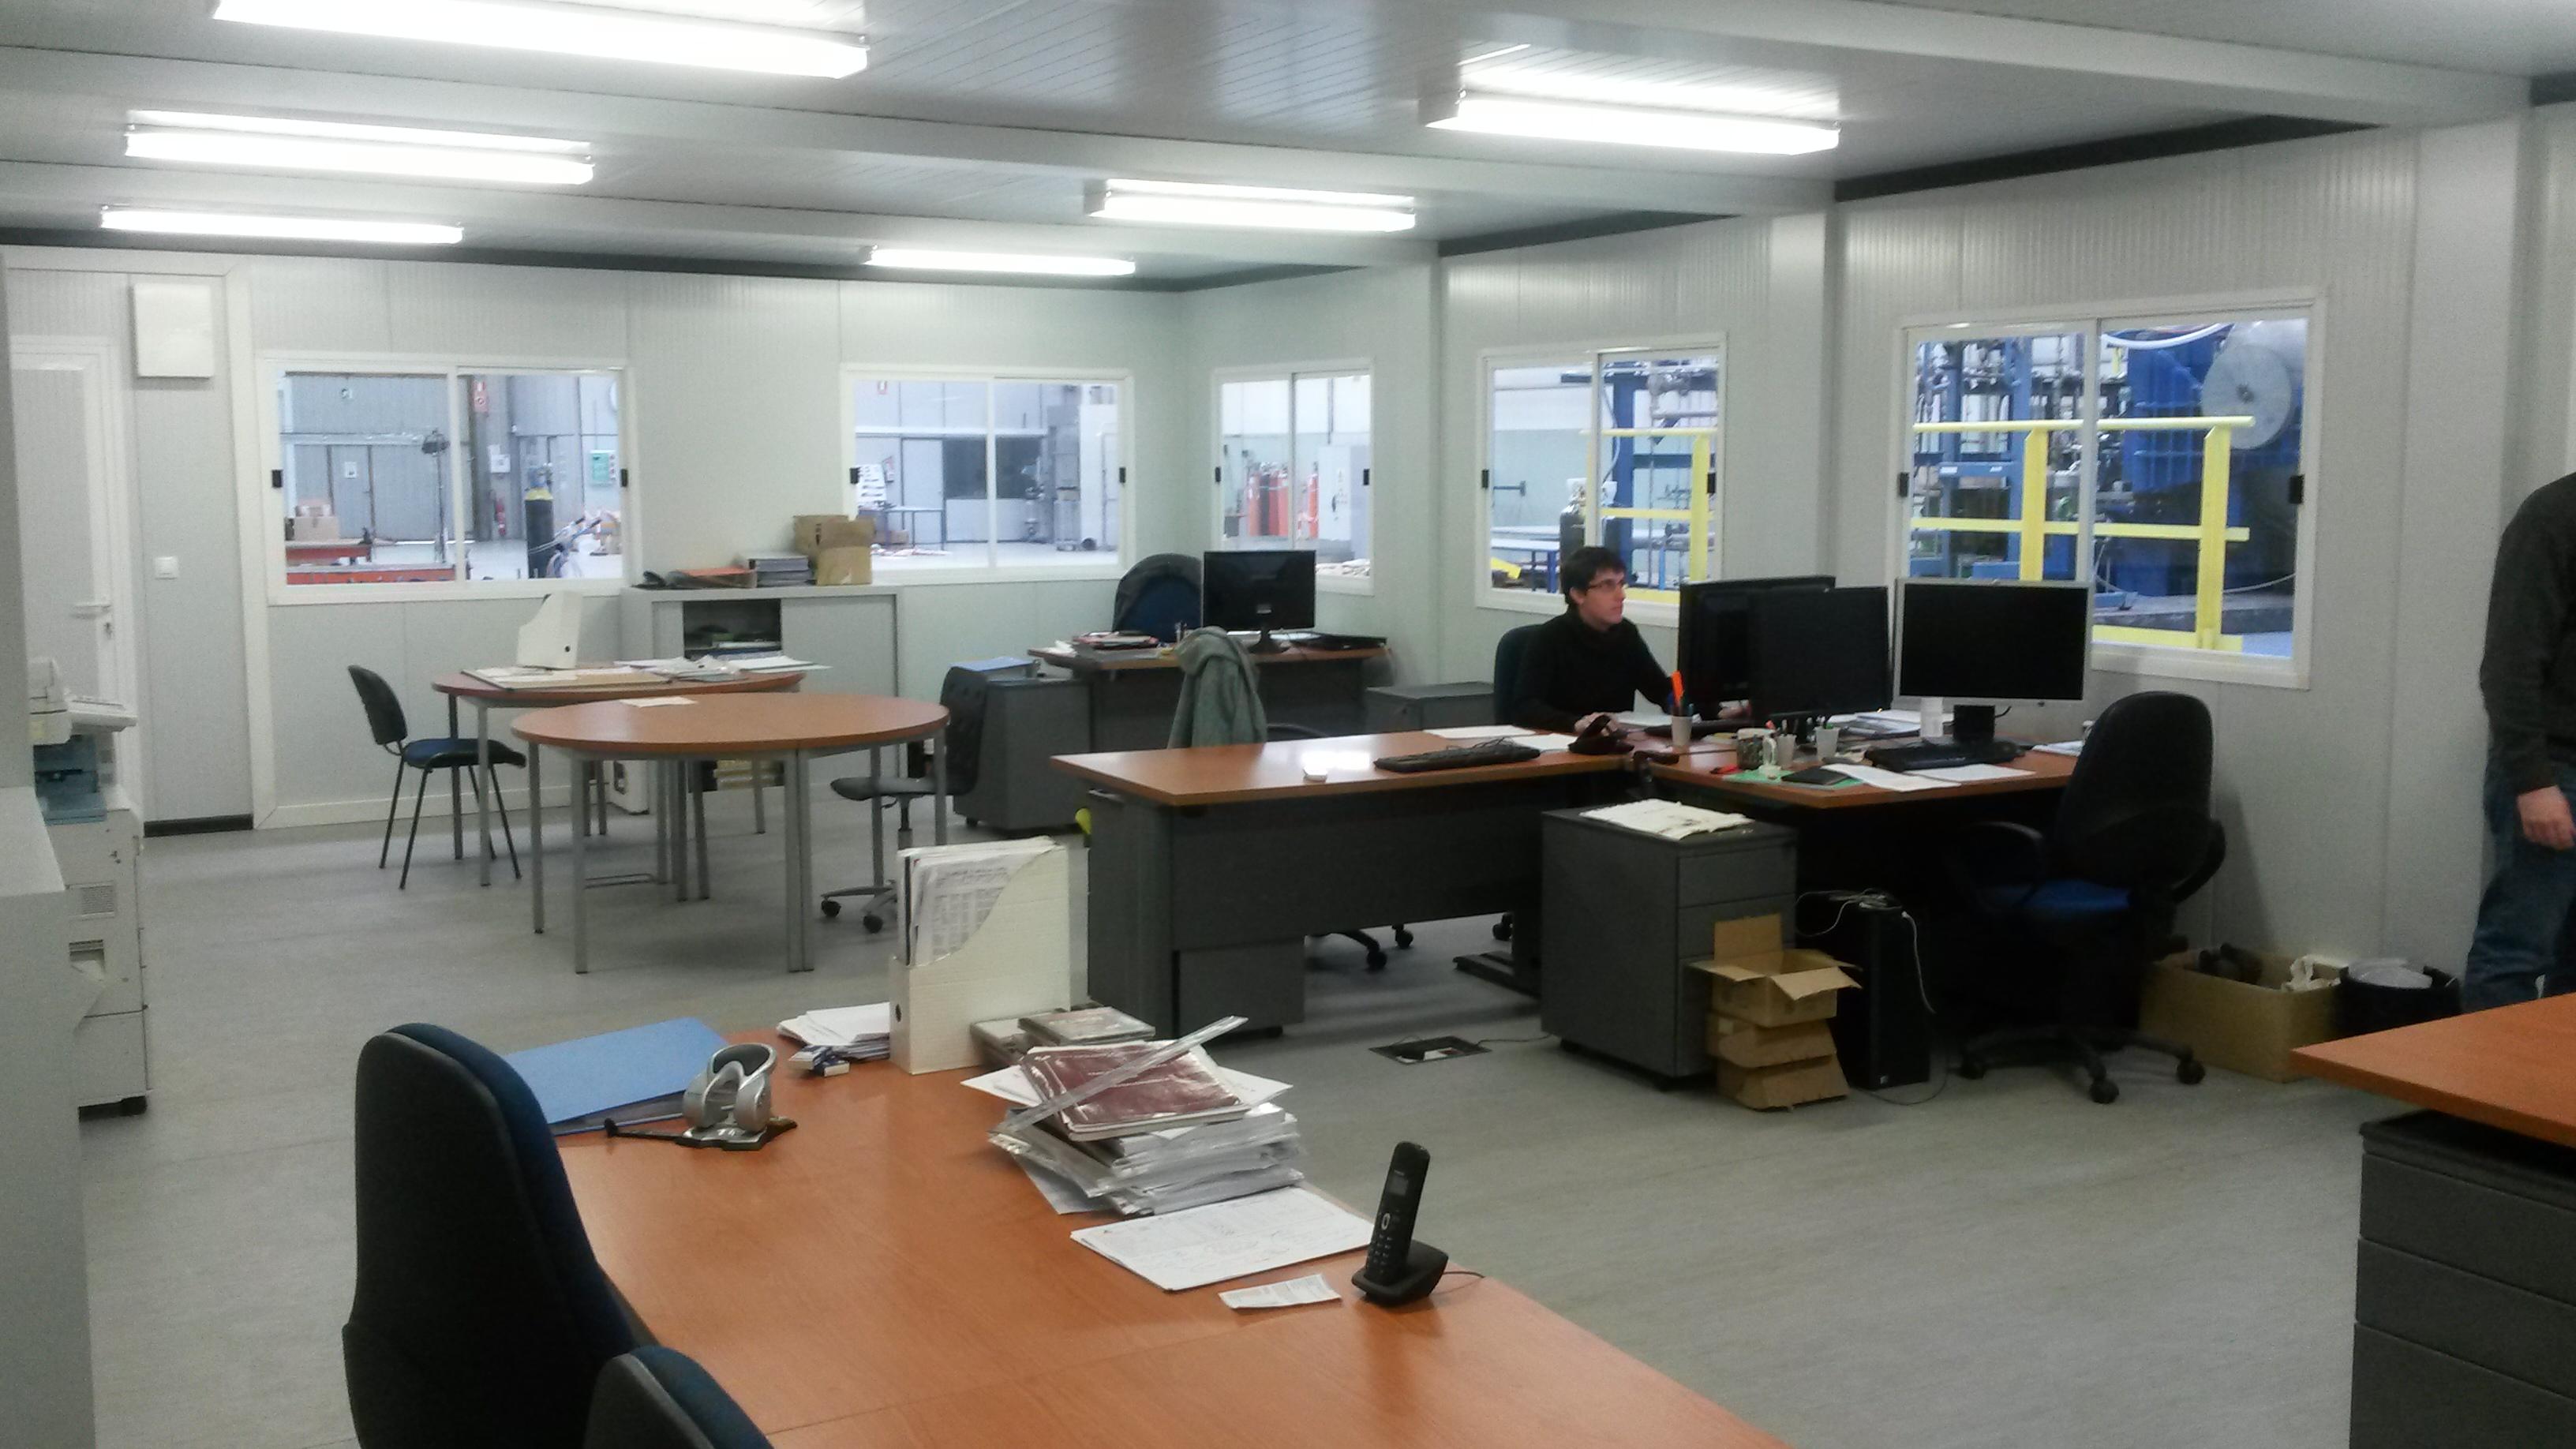 Balat oficina prefabricada di fana en nave industrial balat for Oficina prefabricada